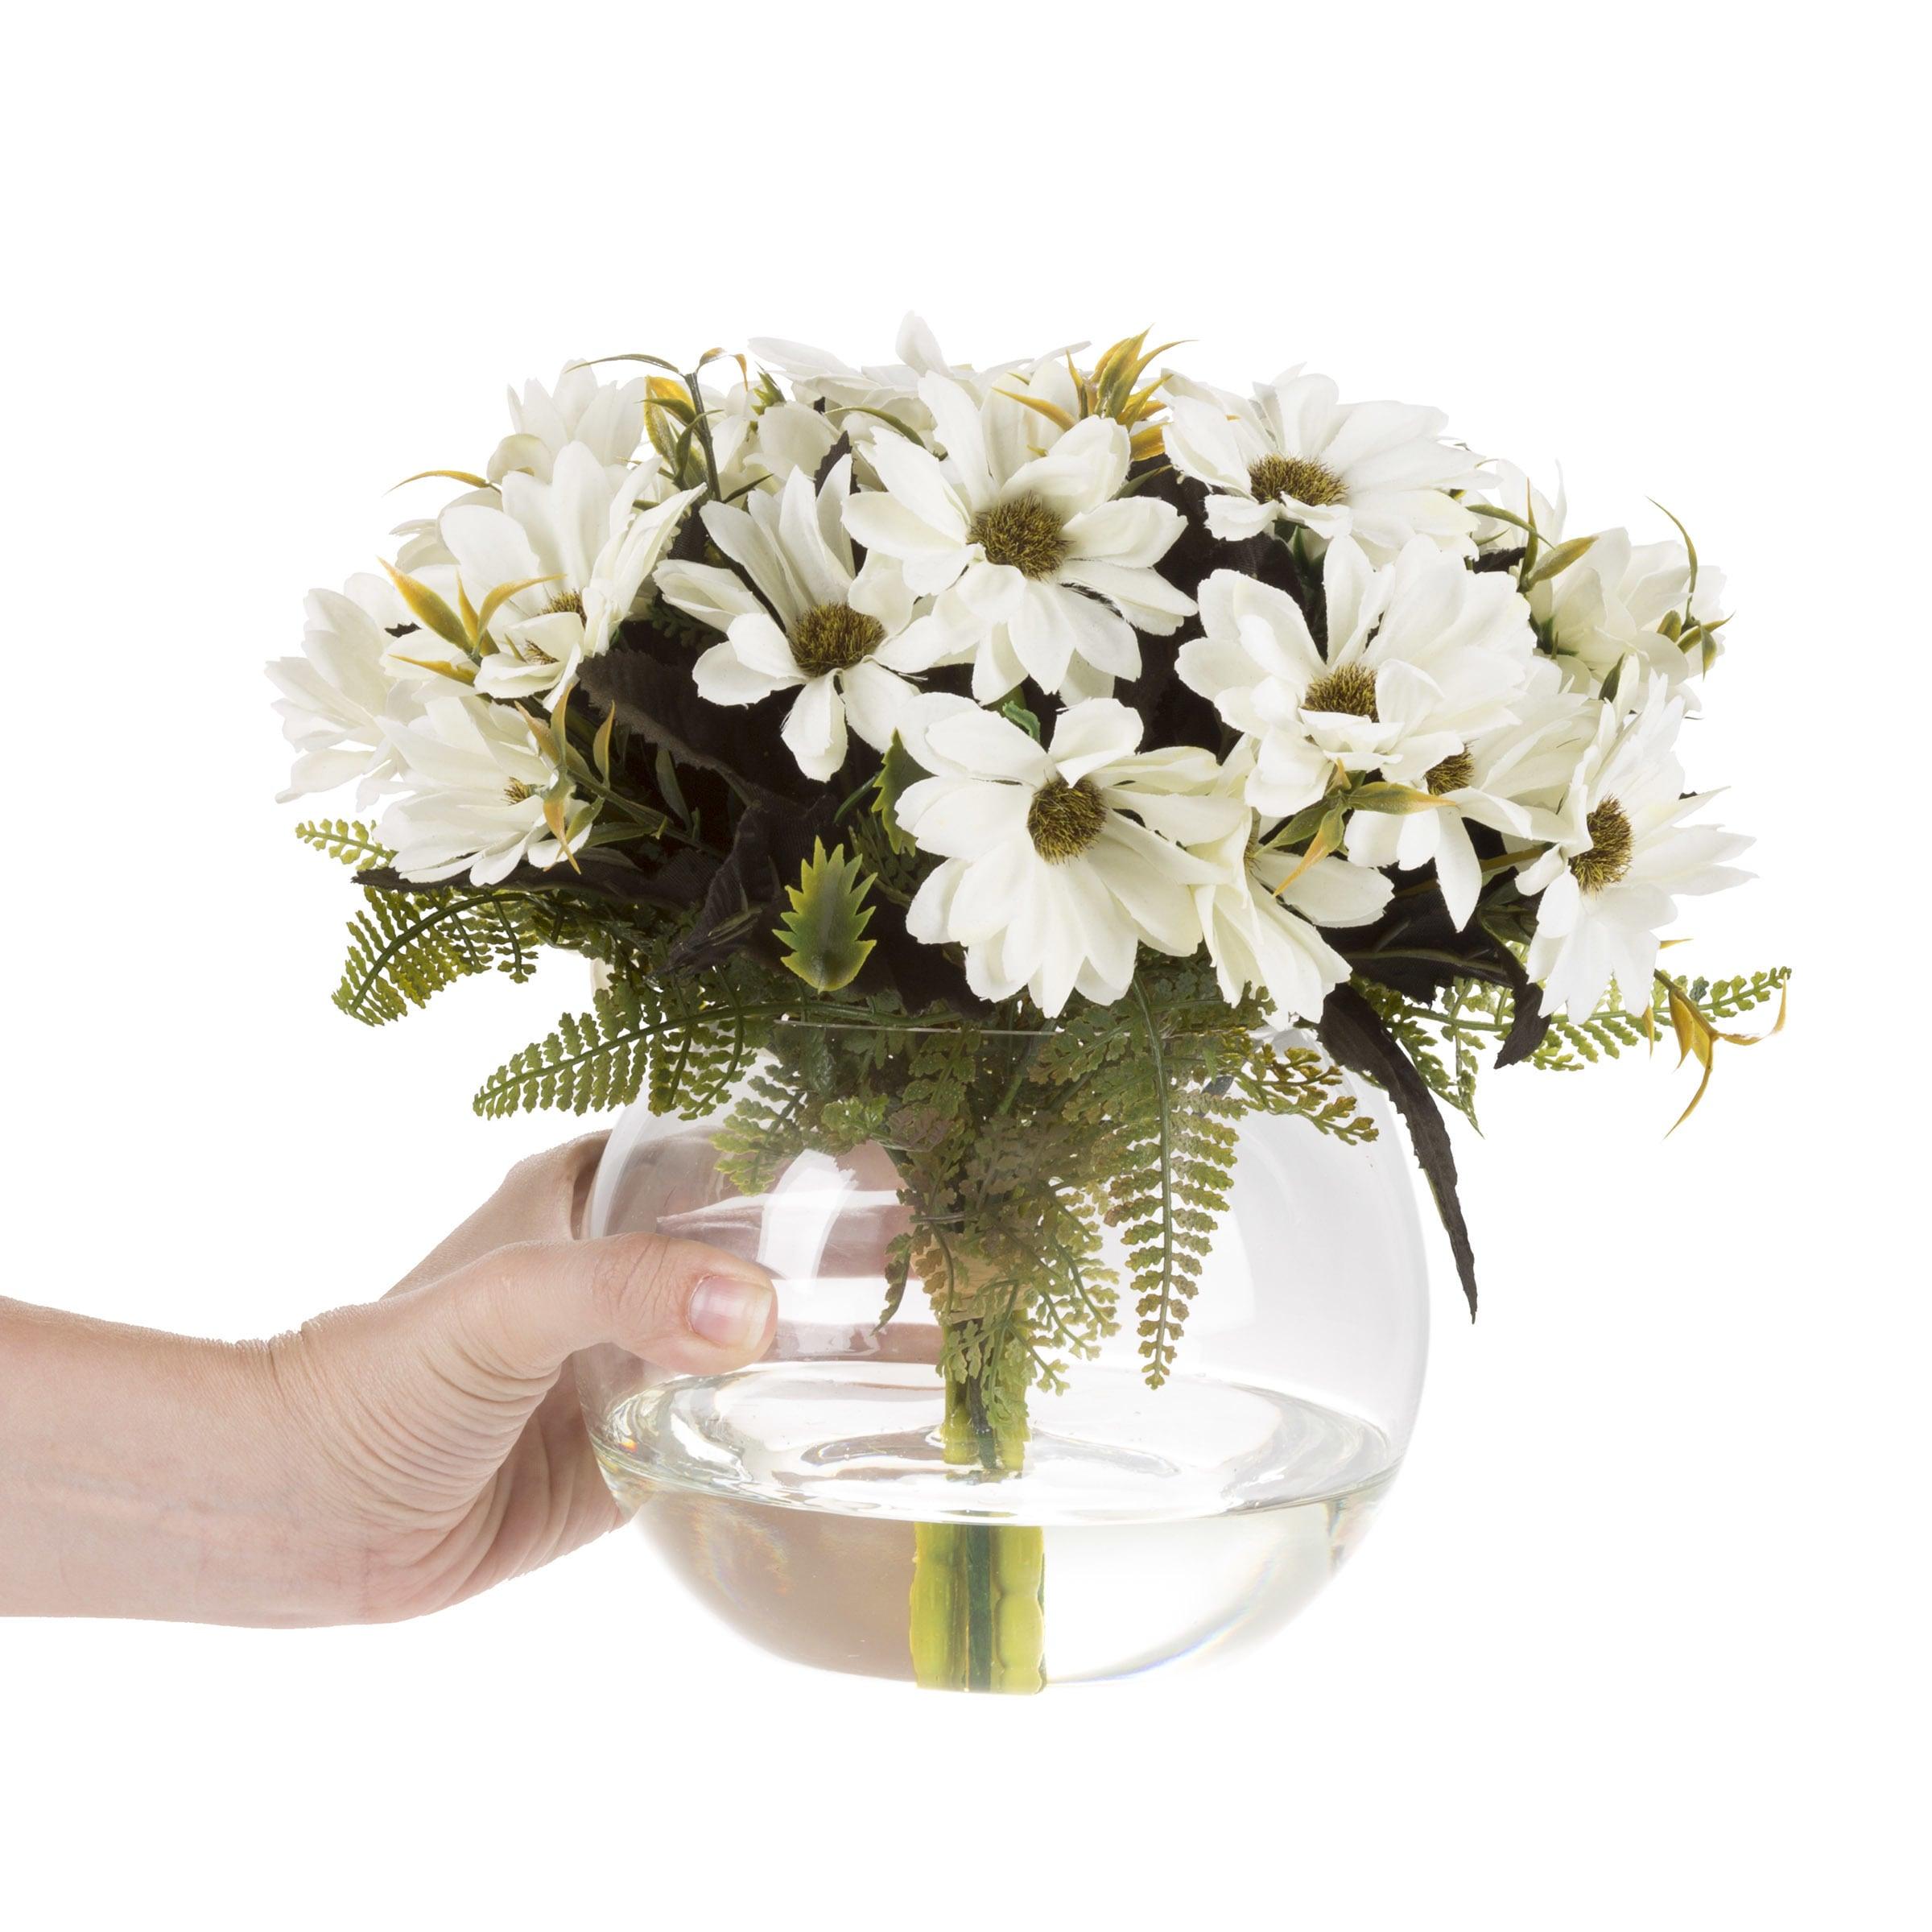 Shop Daisy Artificial Silk Floral Arrangement With Vase And Faux